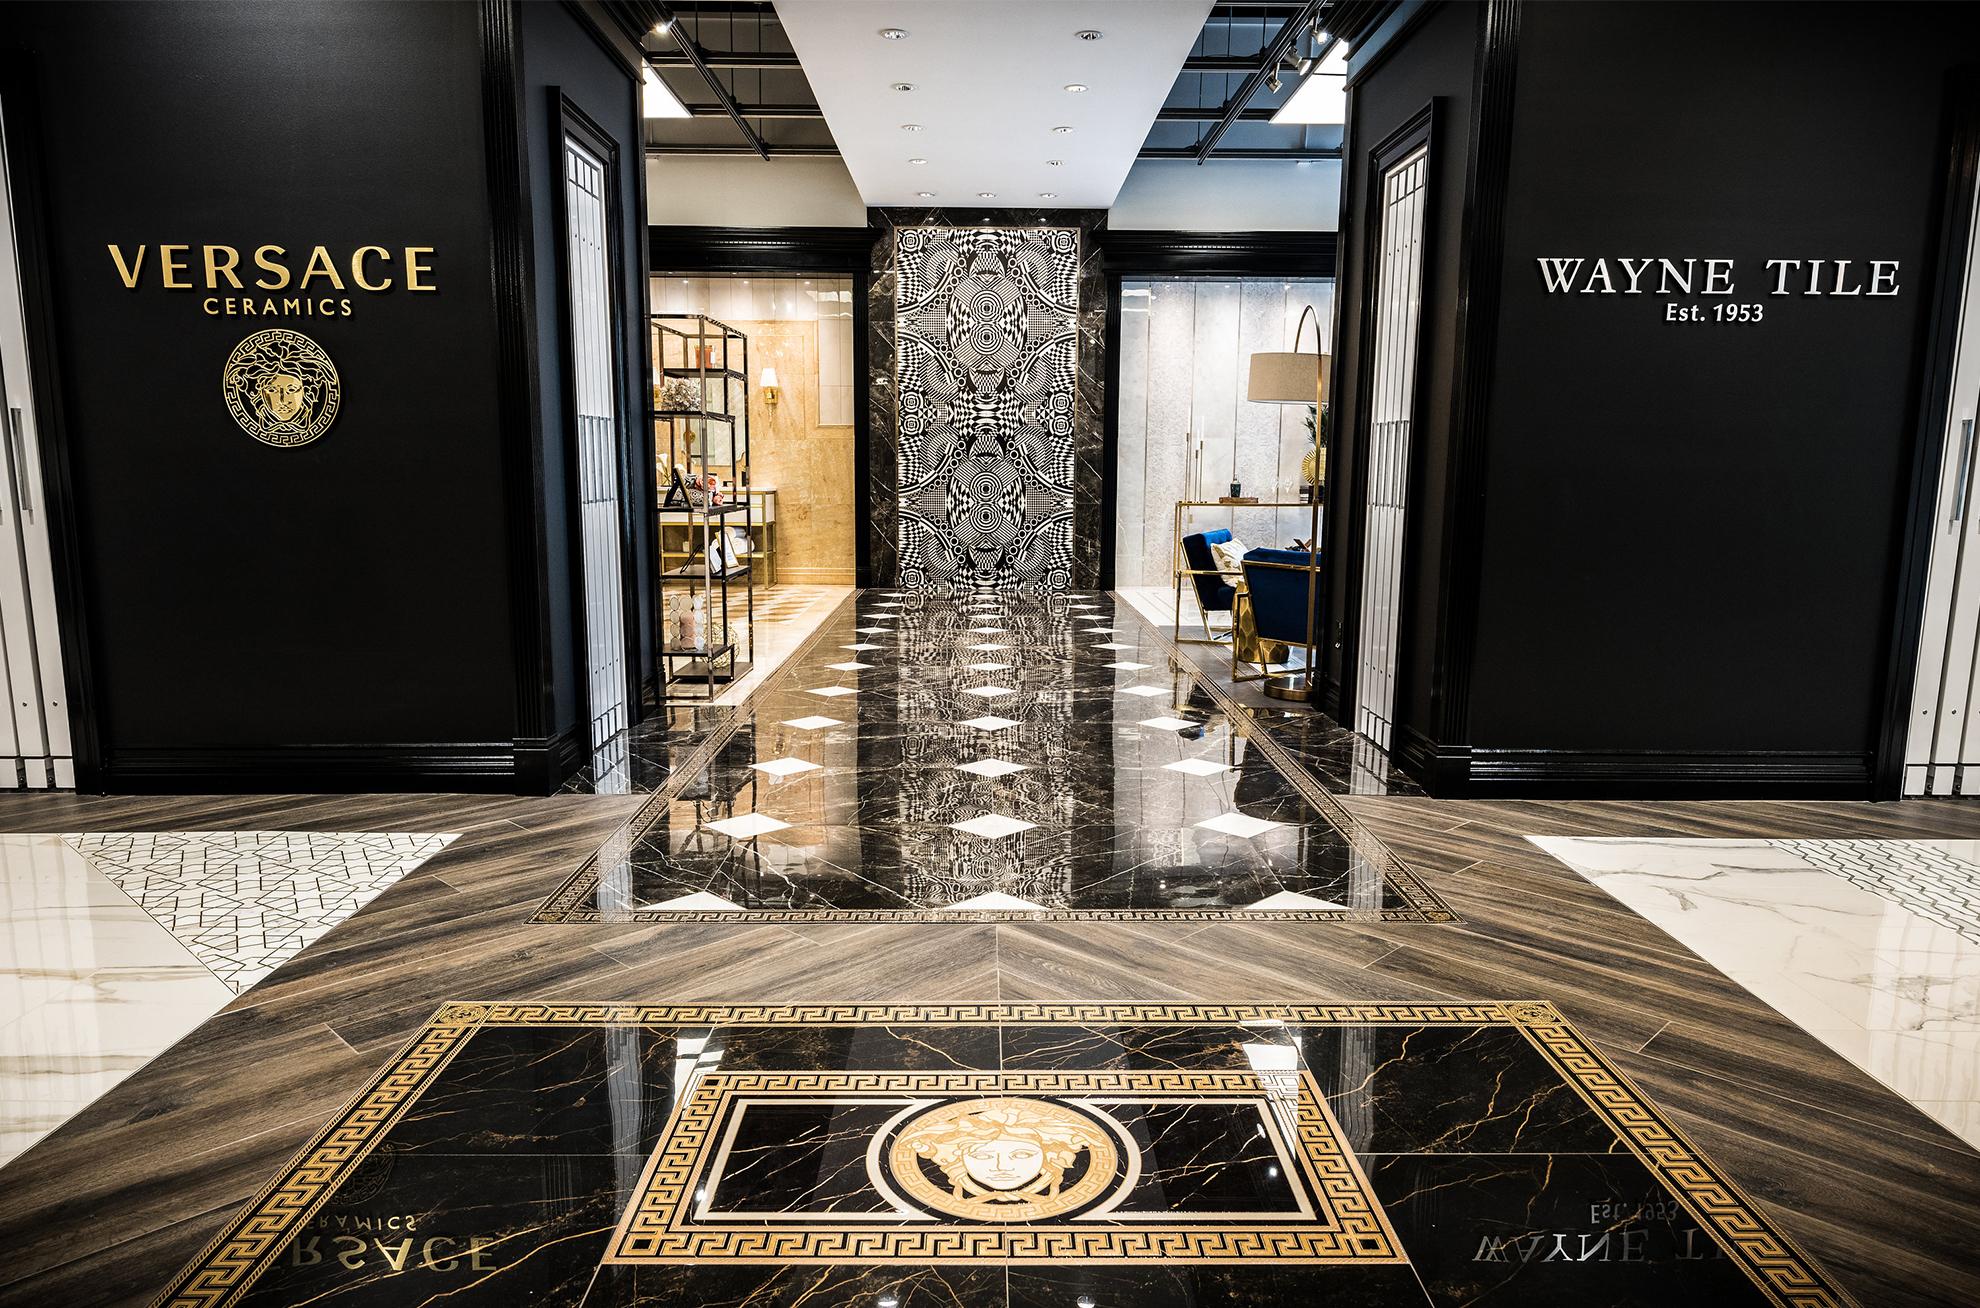 versace wayne tile